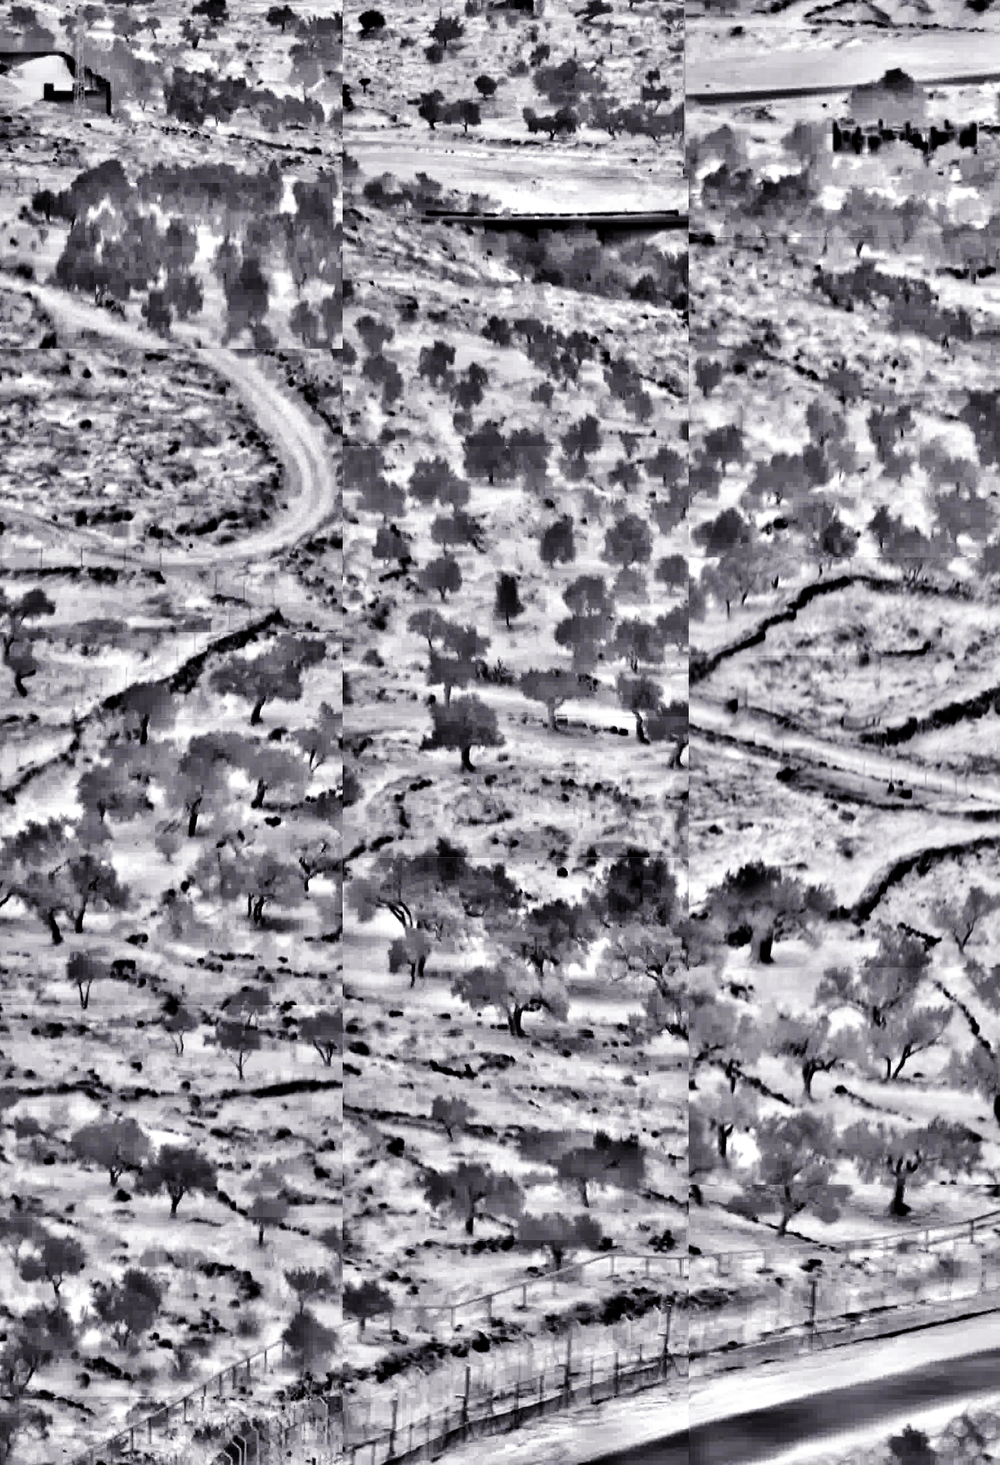 West Bank,الضفة الغربية,המערבית הגדה.jpg